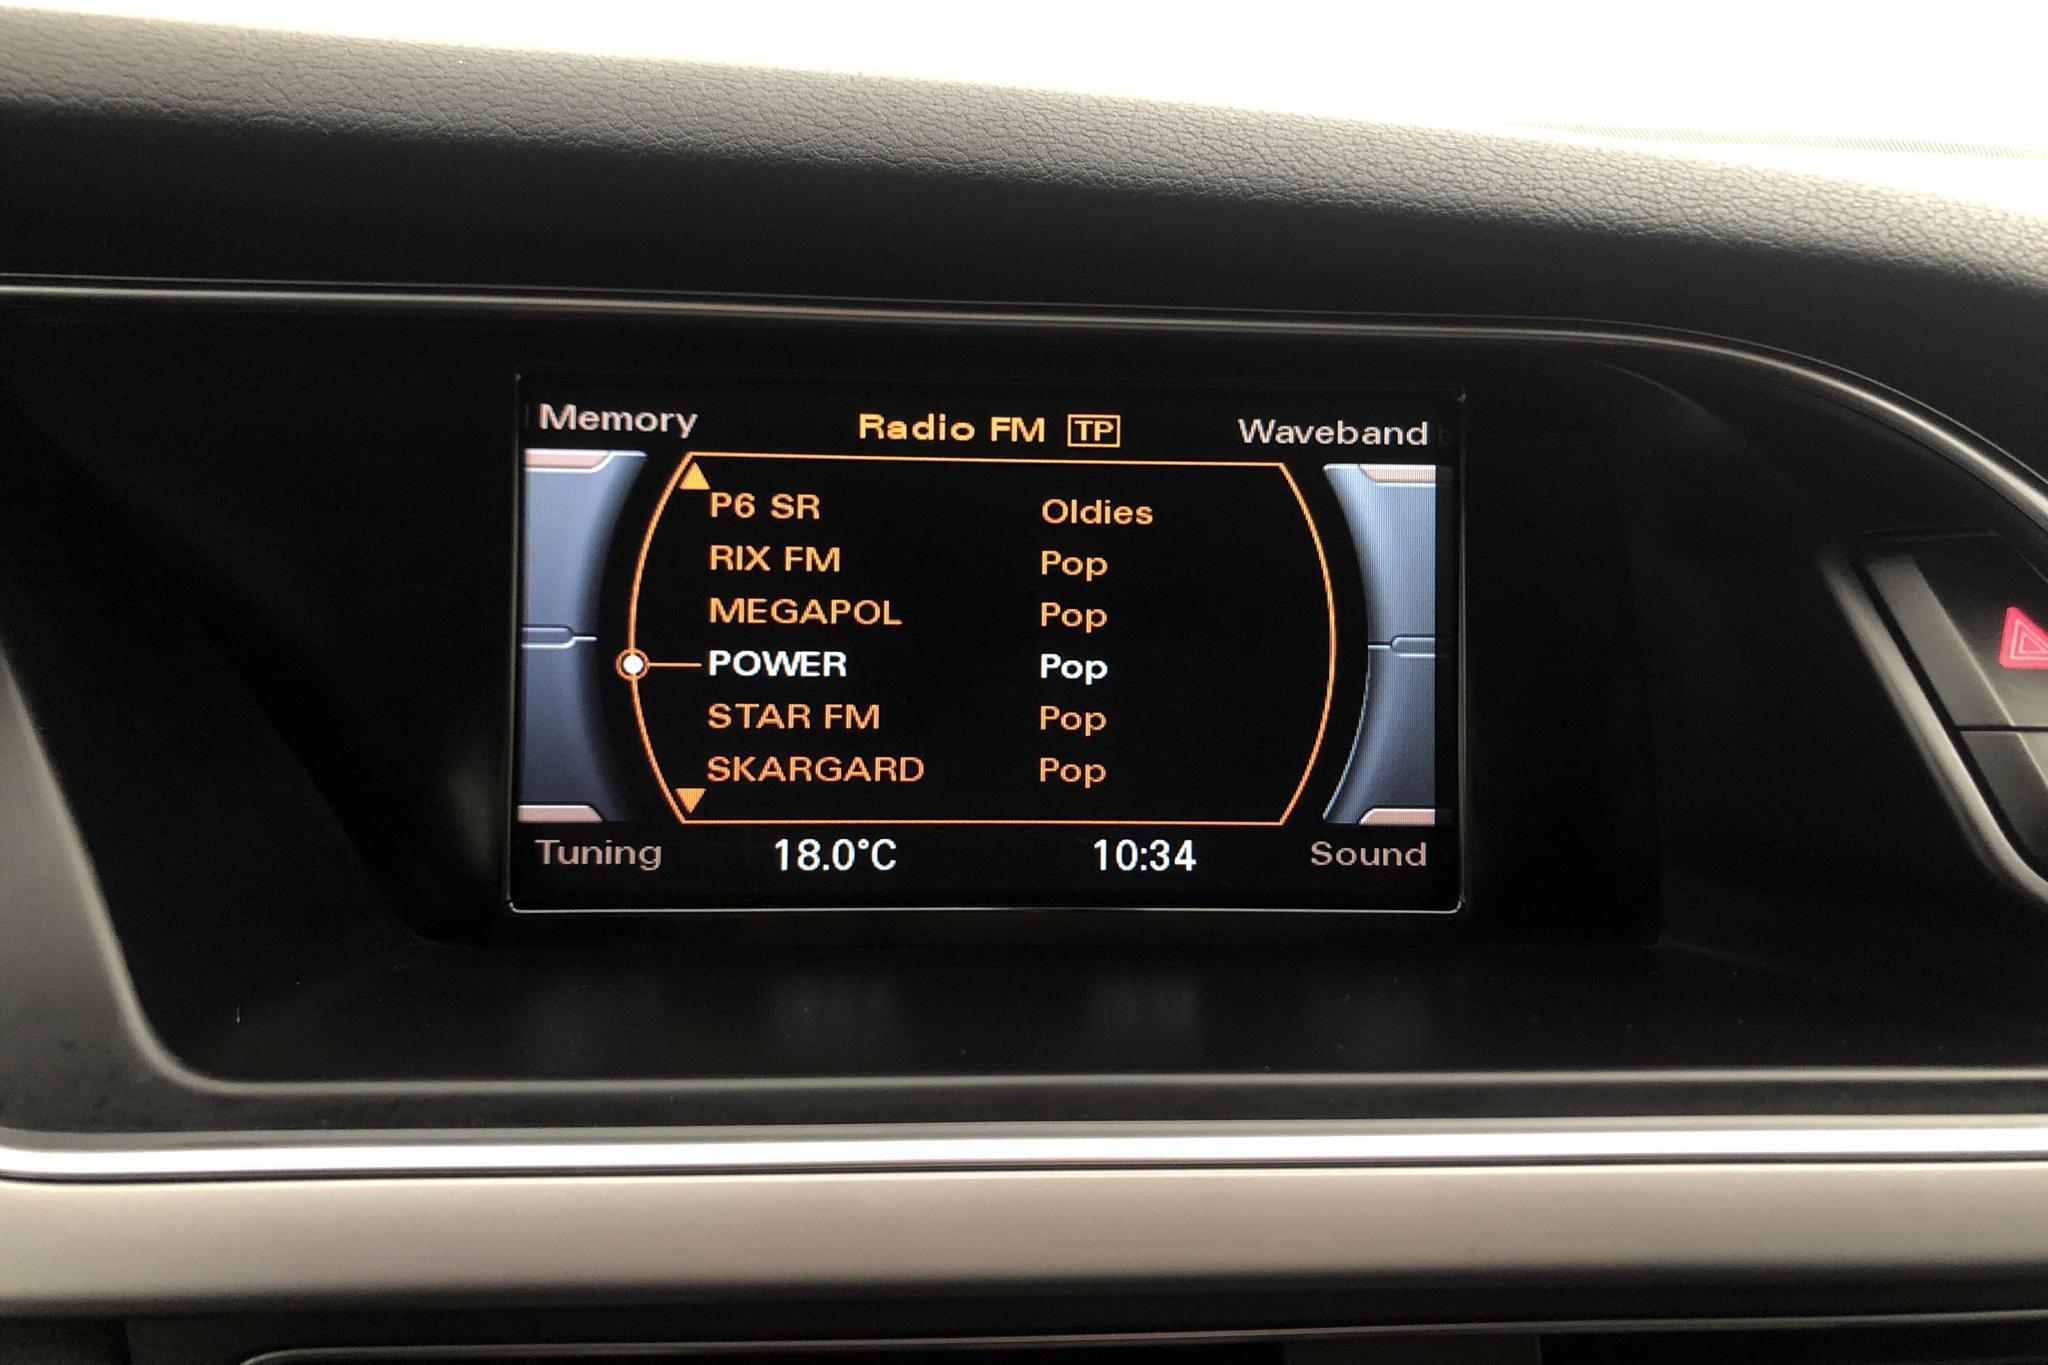 Audi A4 Allroad 2.0 TDI Avant quattro (177hk) - 147 150 km - Automatic - black - 2014